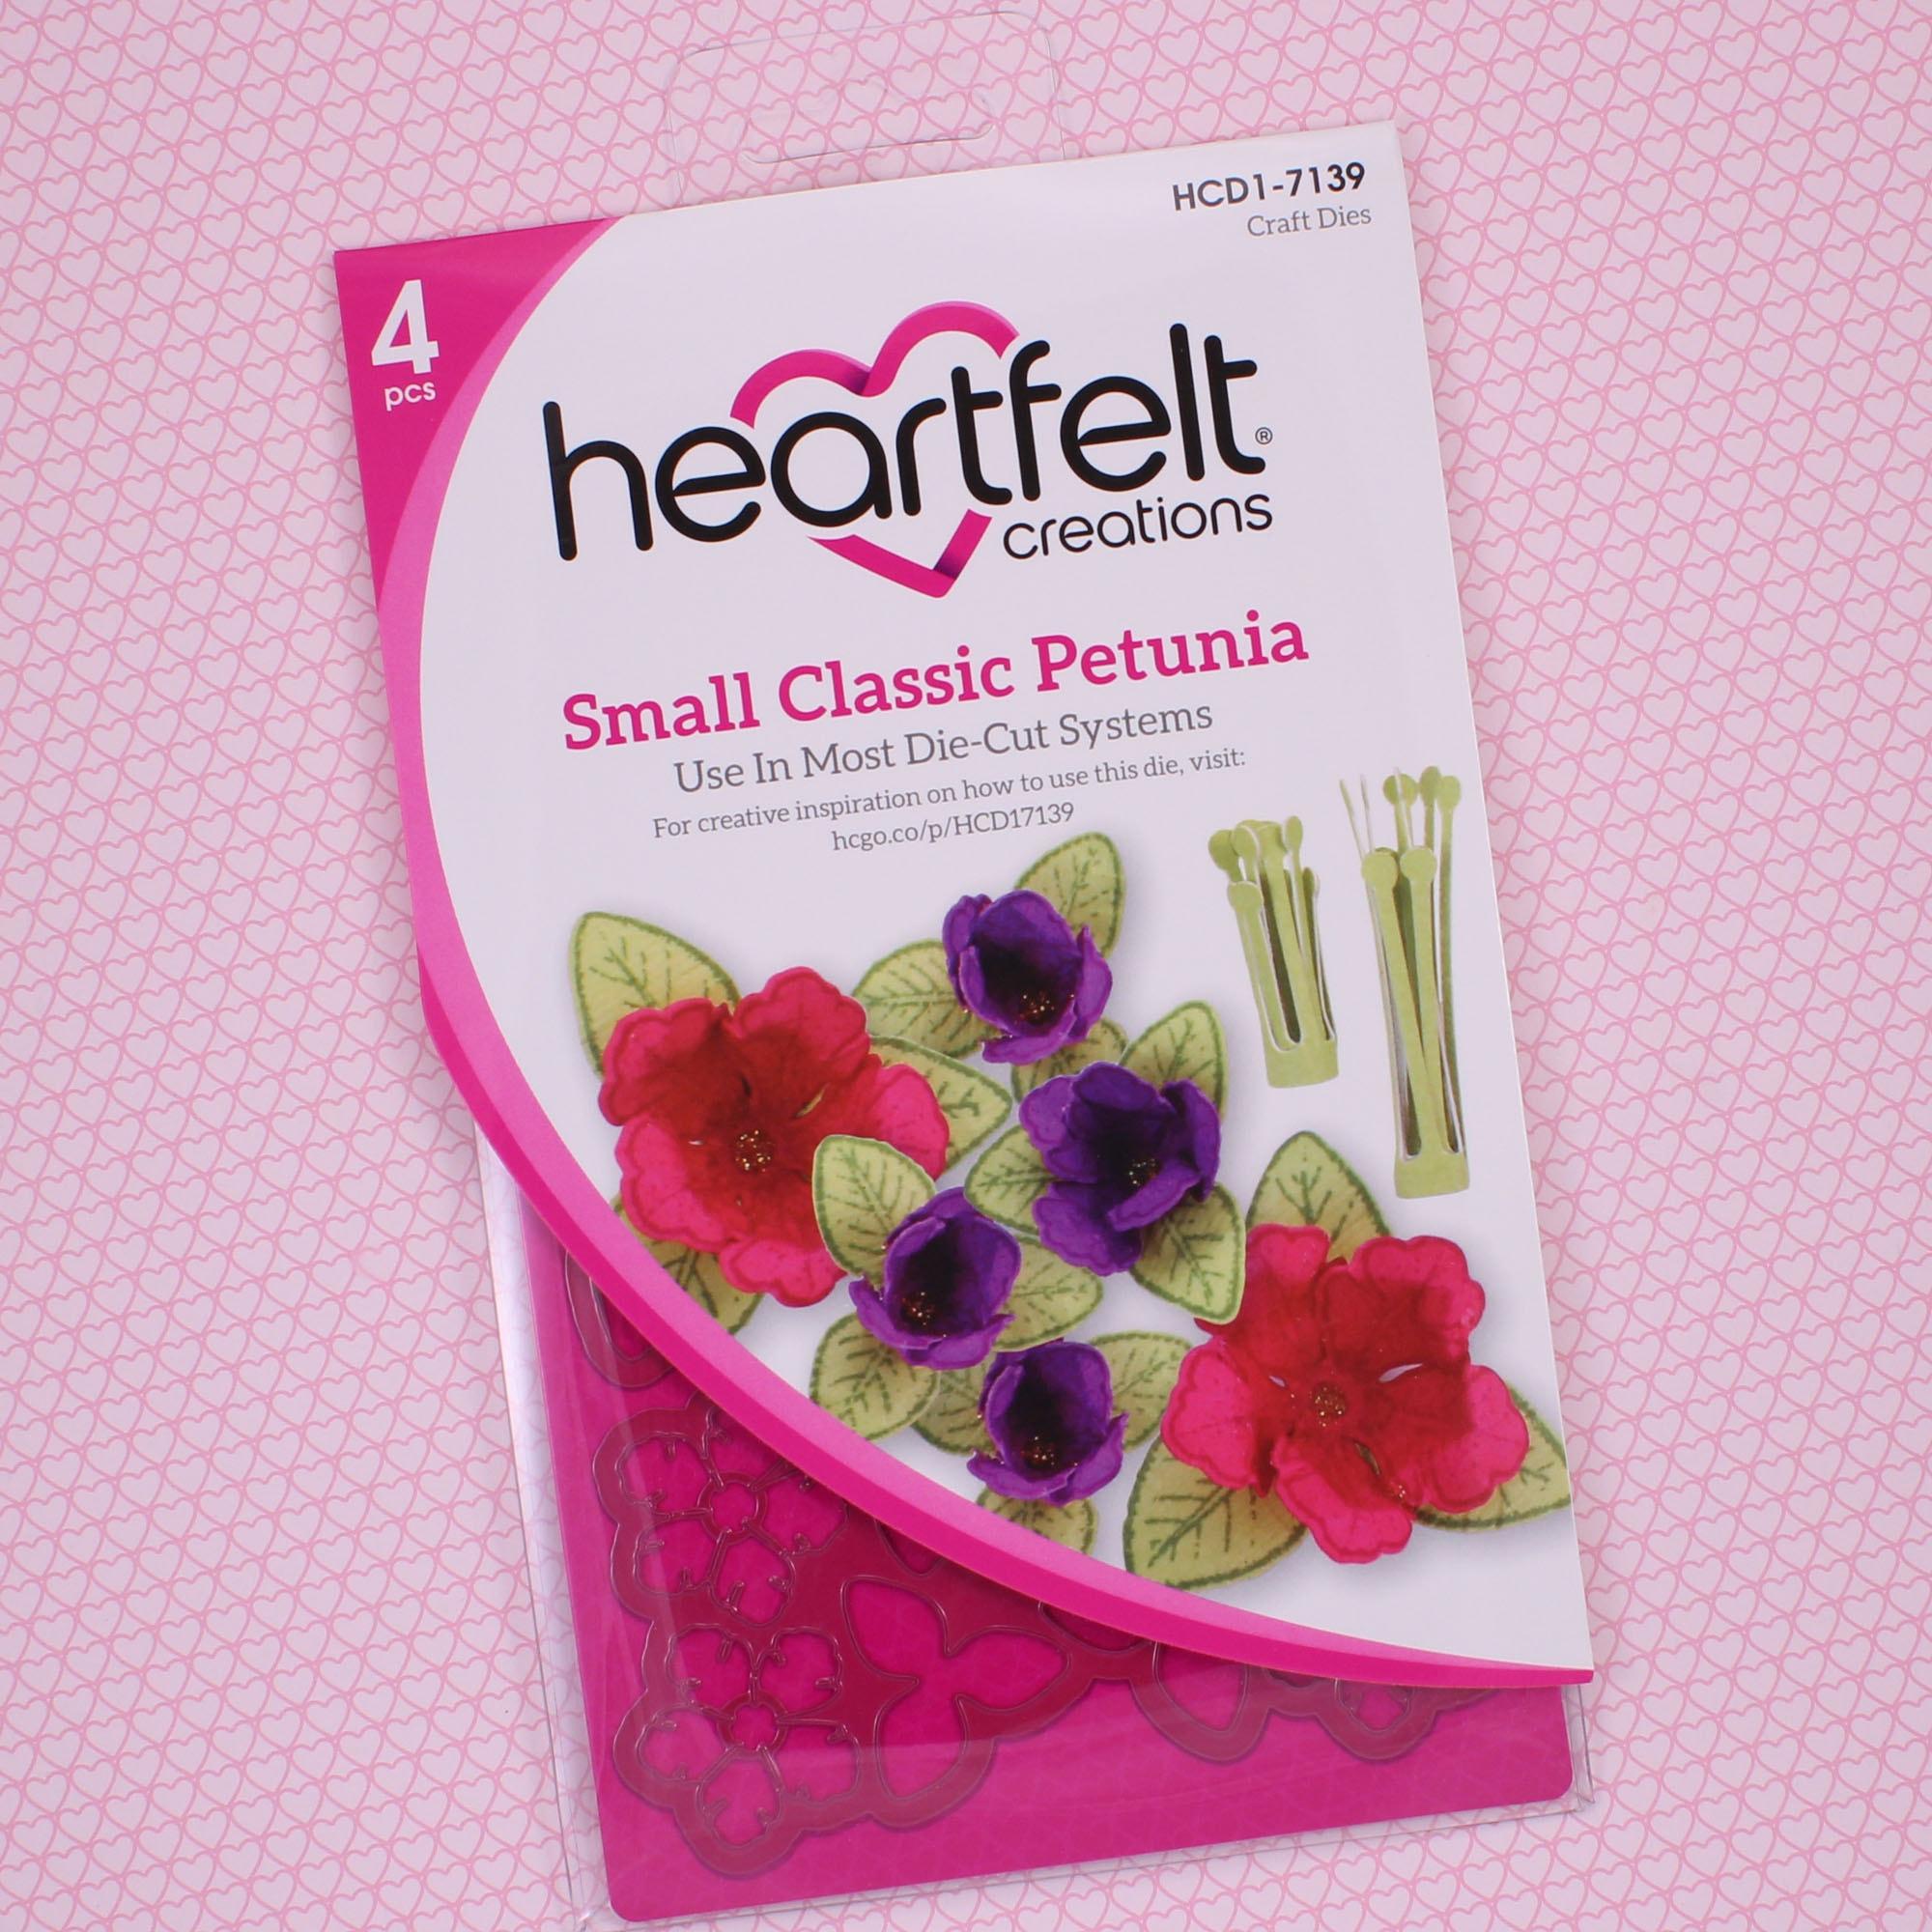 Small Classic Petunia Die